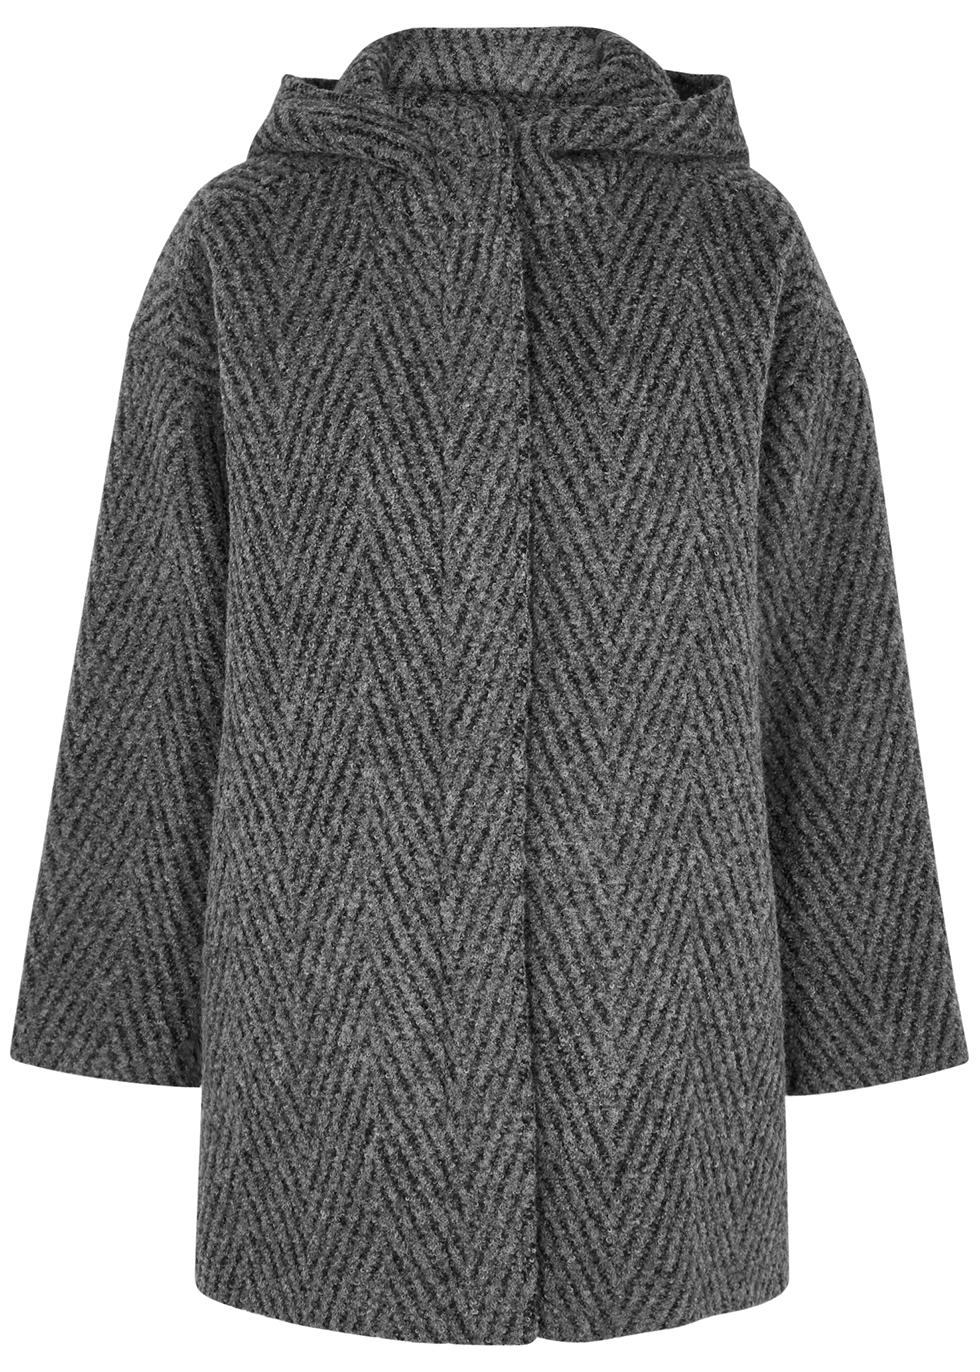 Grey bouclé alpaca and wool-blend coat